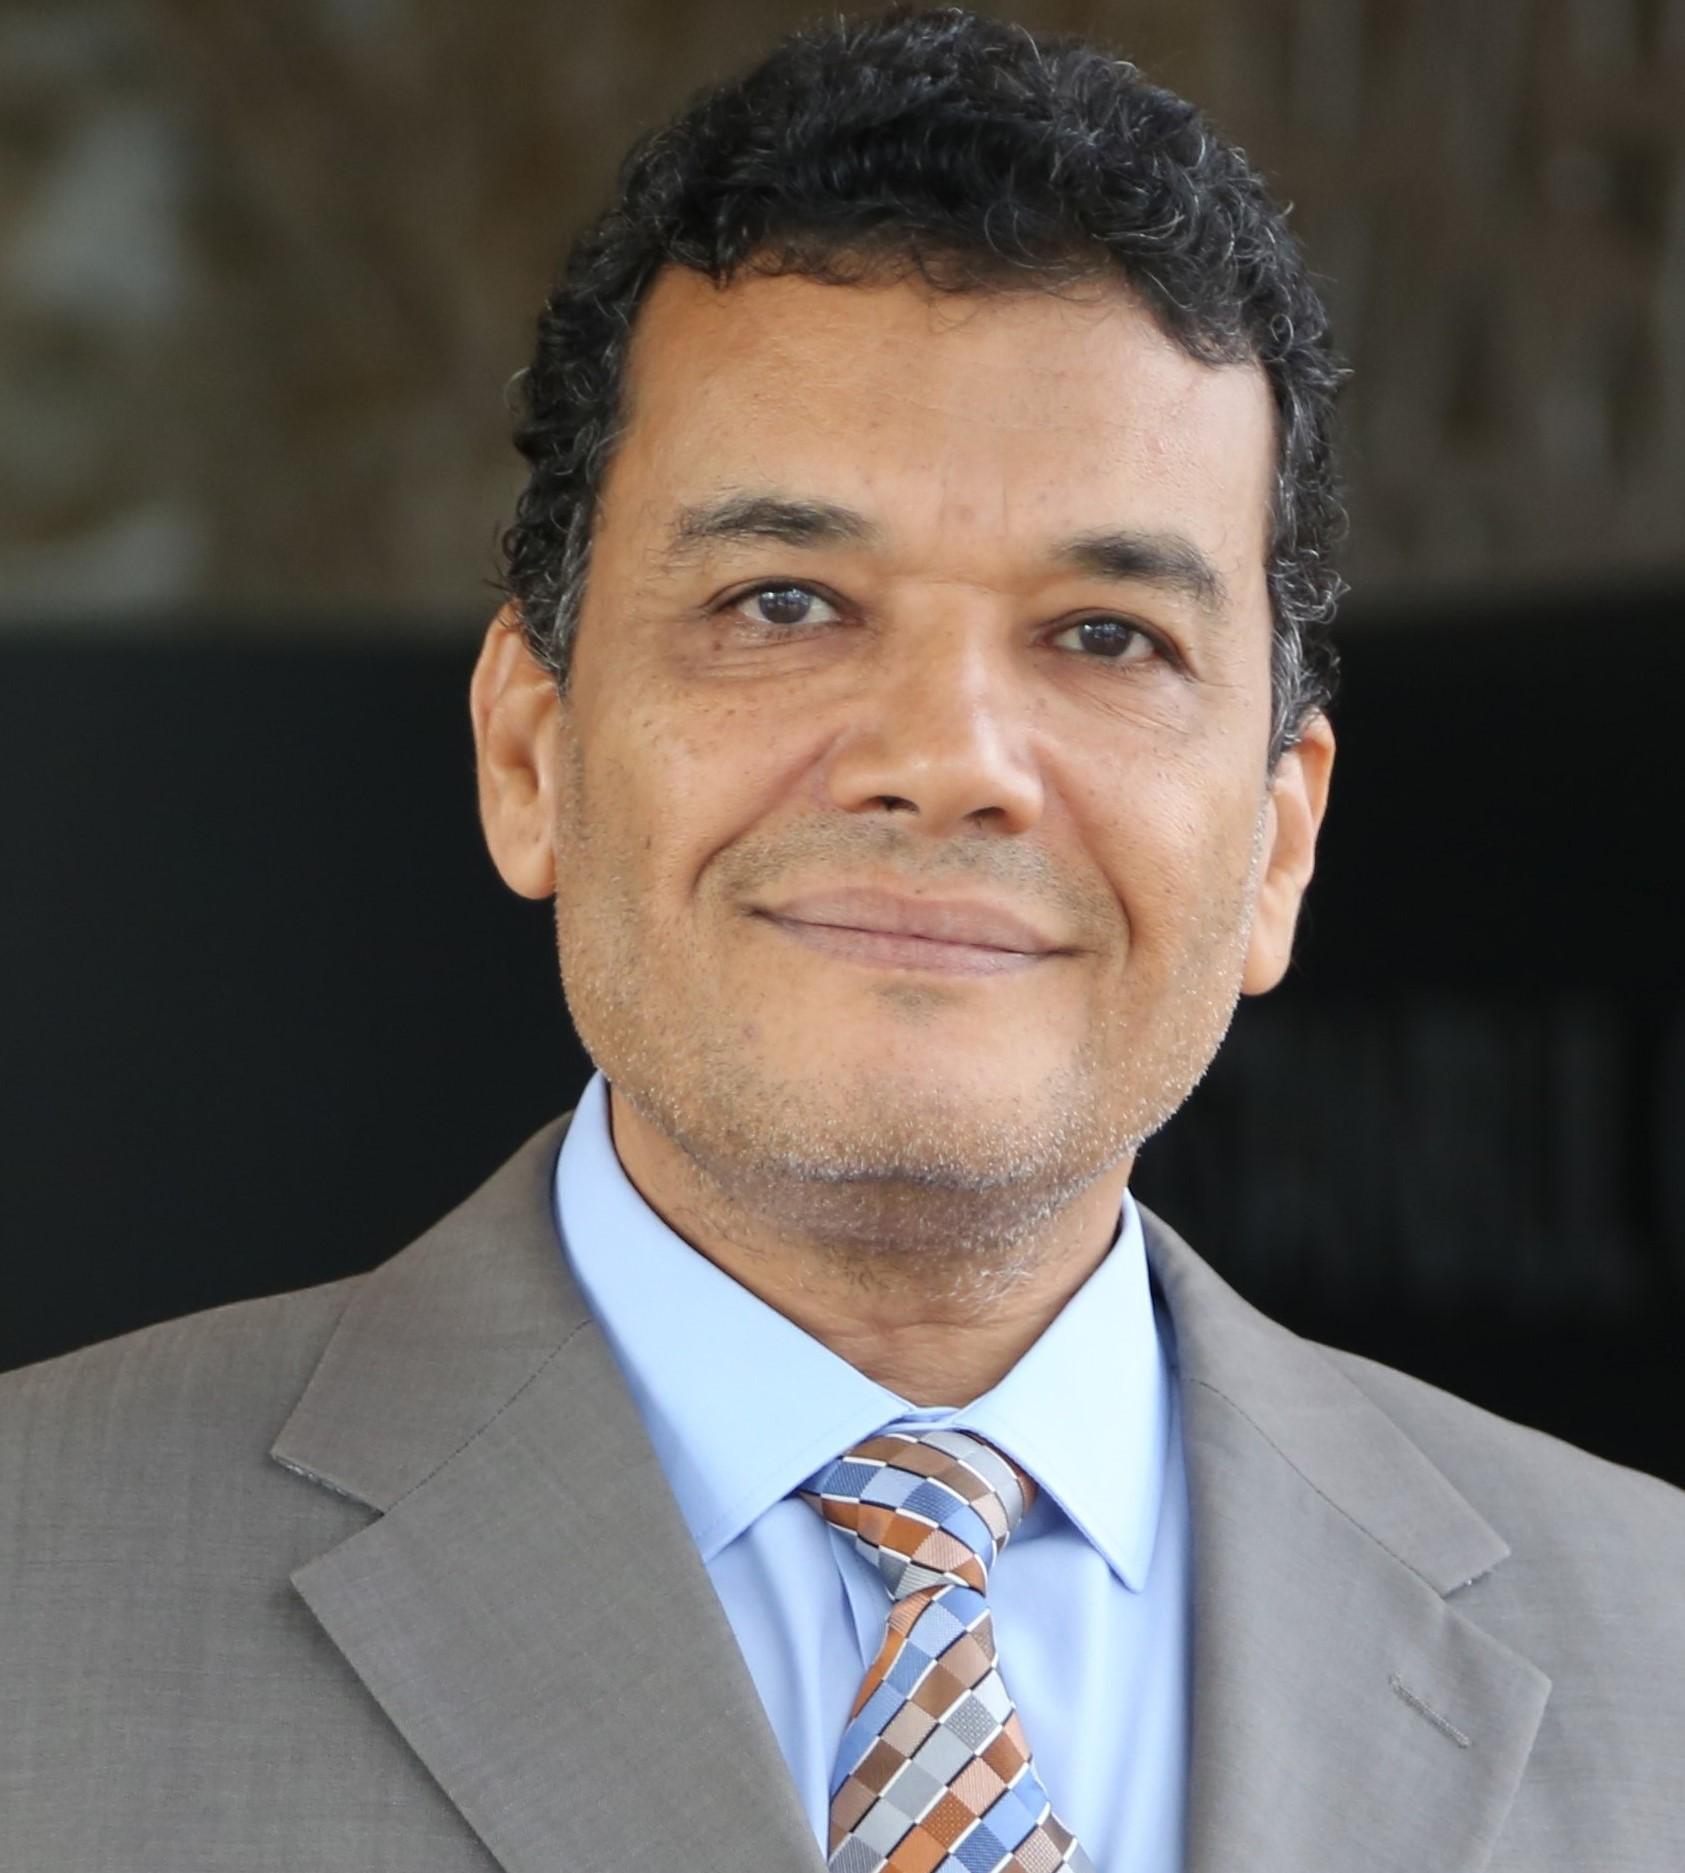 Dr.Öğr.Üyesi TARIQ HASSAN MAHMOUD ELHADARY